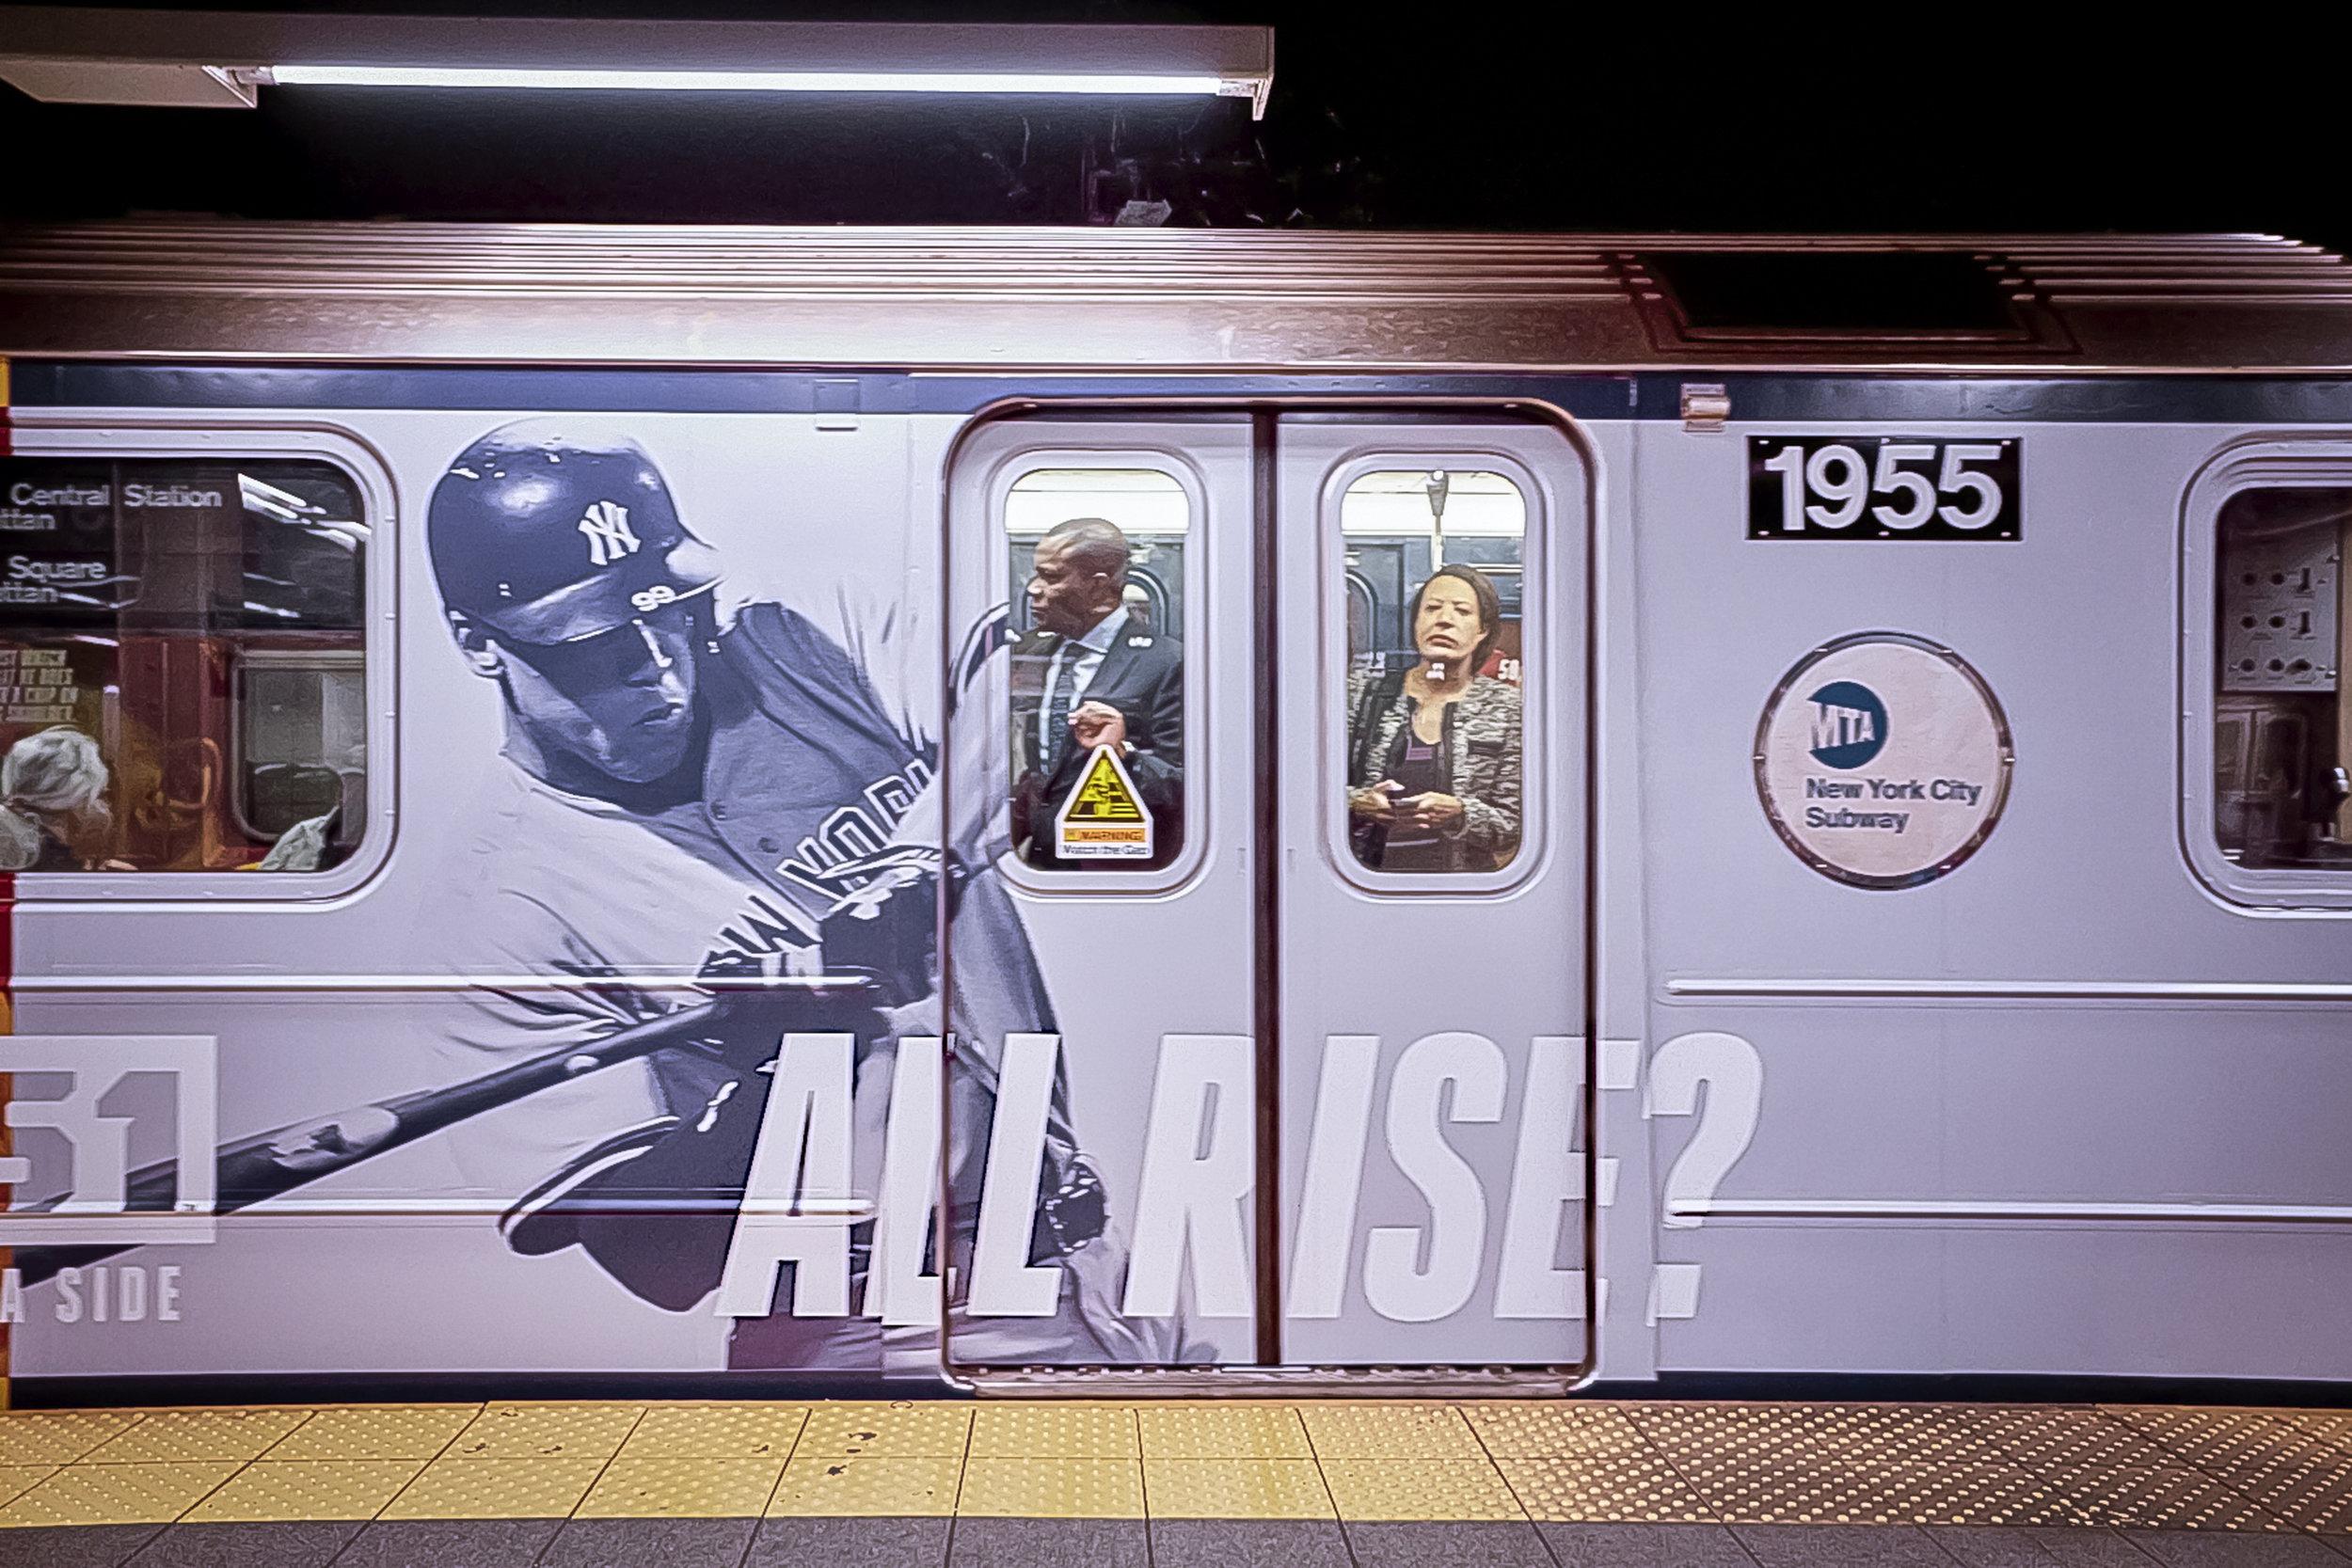 FS1_subway_shots_30.jpg